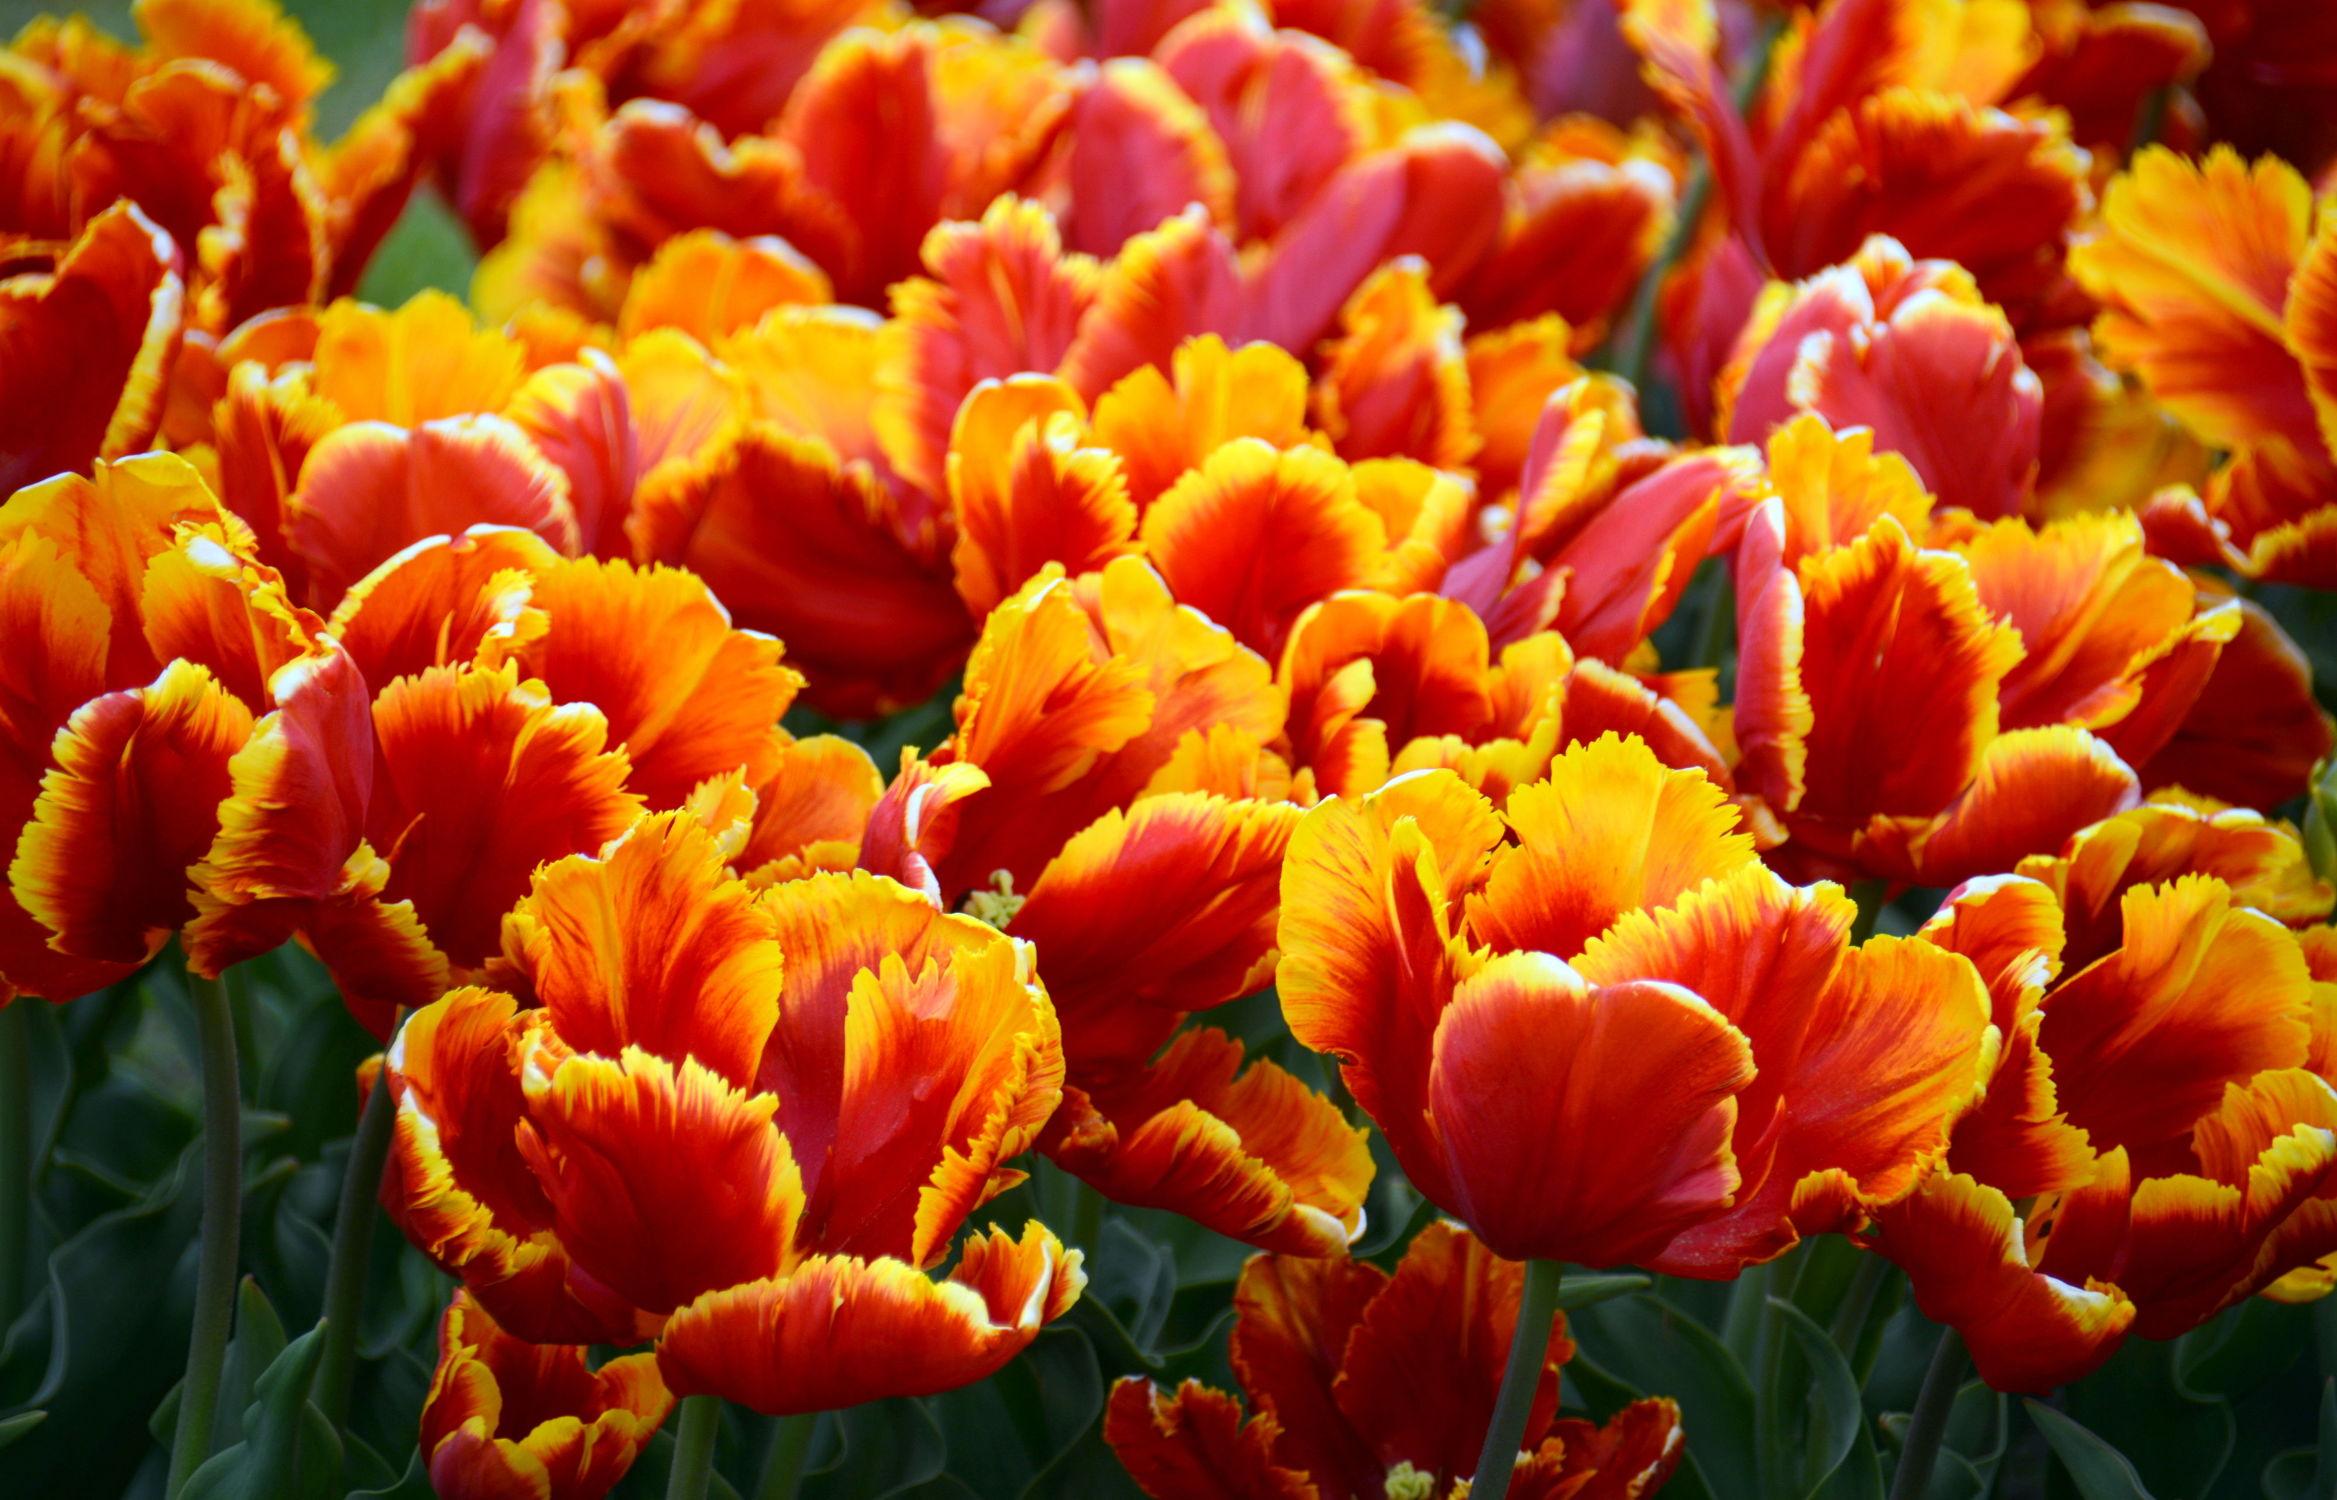 Bild mit Orange, Gelb, Frühling, Rot, Tulpe, Tulips, Tulpen, Tulip, Tapete, Blütenreich, wandtapete, fototapete, intensiv, tulpenbeet, frühblüher, frühjahr, tulpenmeer, tulpenblüten, tulpenblüte, vielblütig, tulpenfeld, feurig